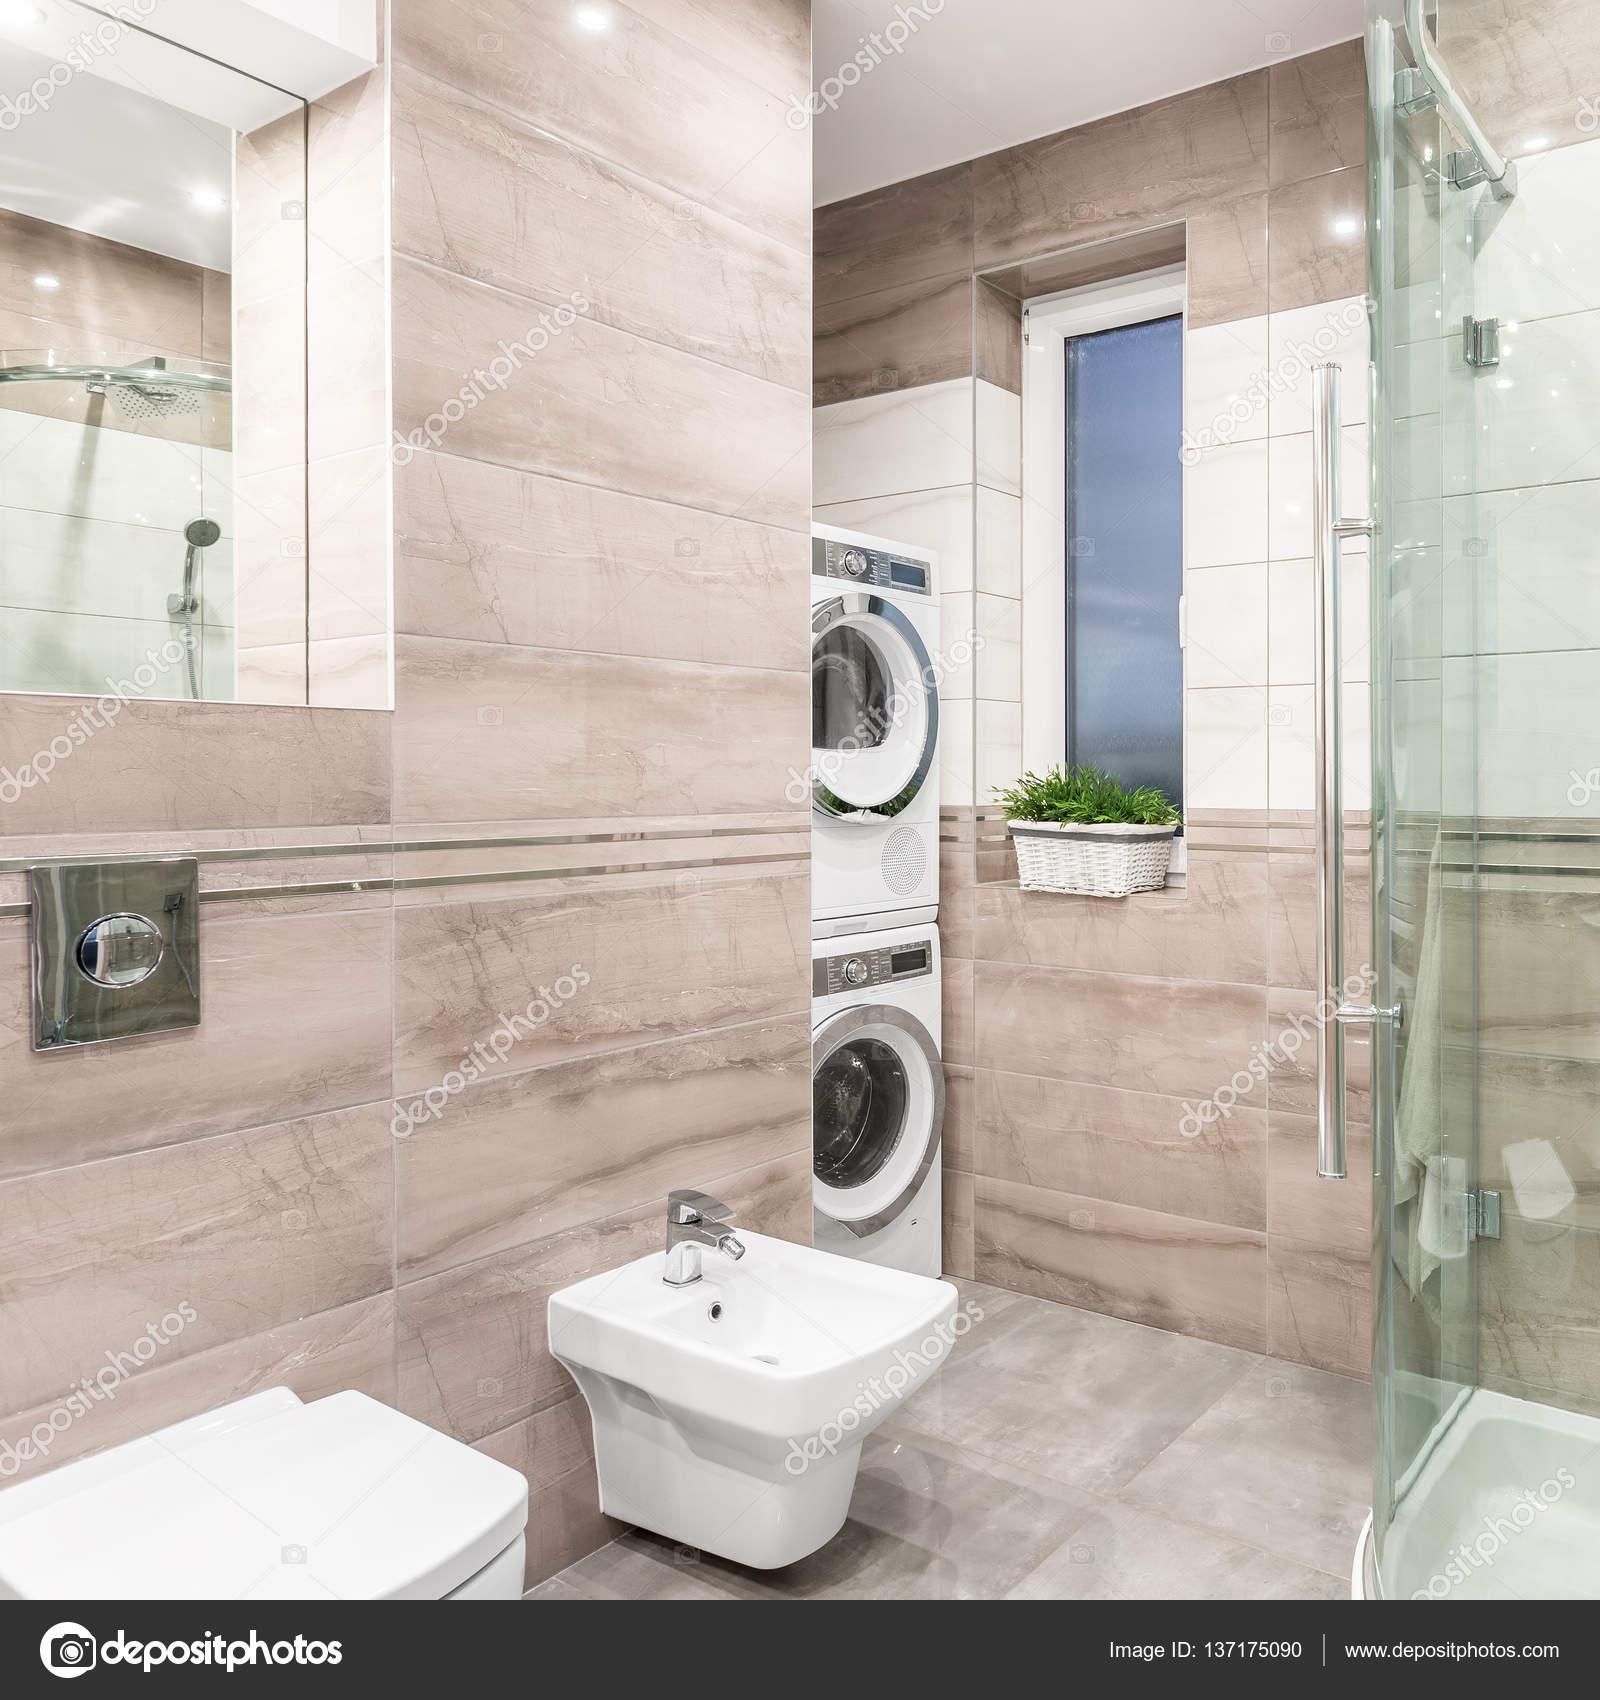 bagno con zona lavanderia — Foto Stock © in4mal #137175090